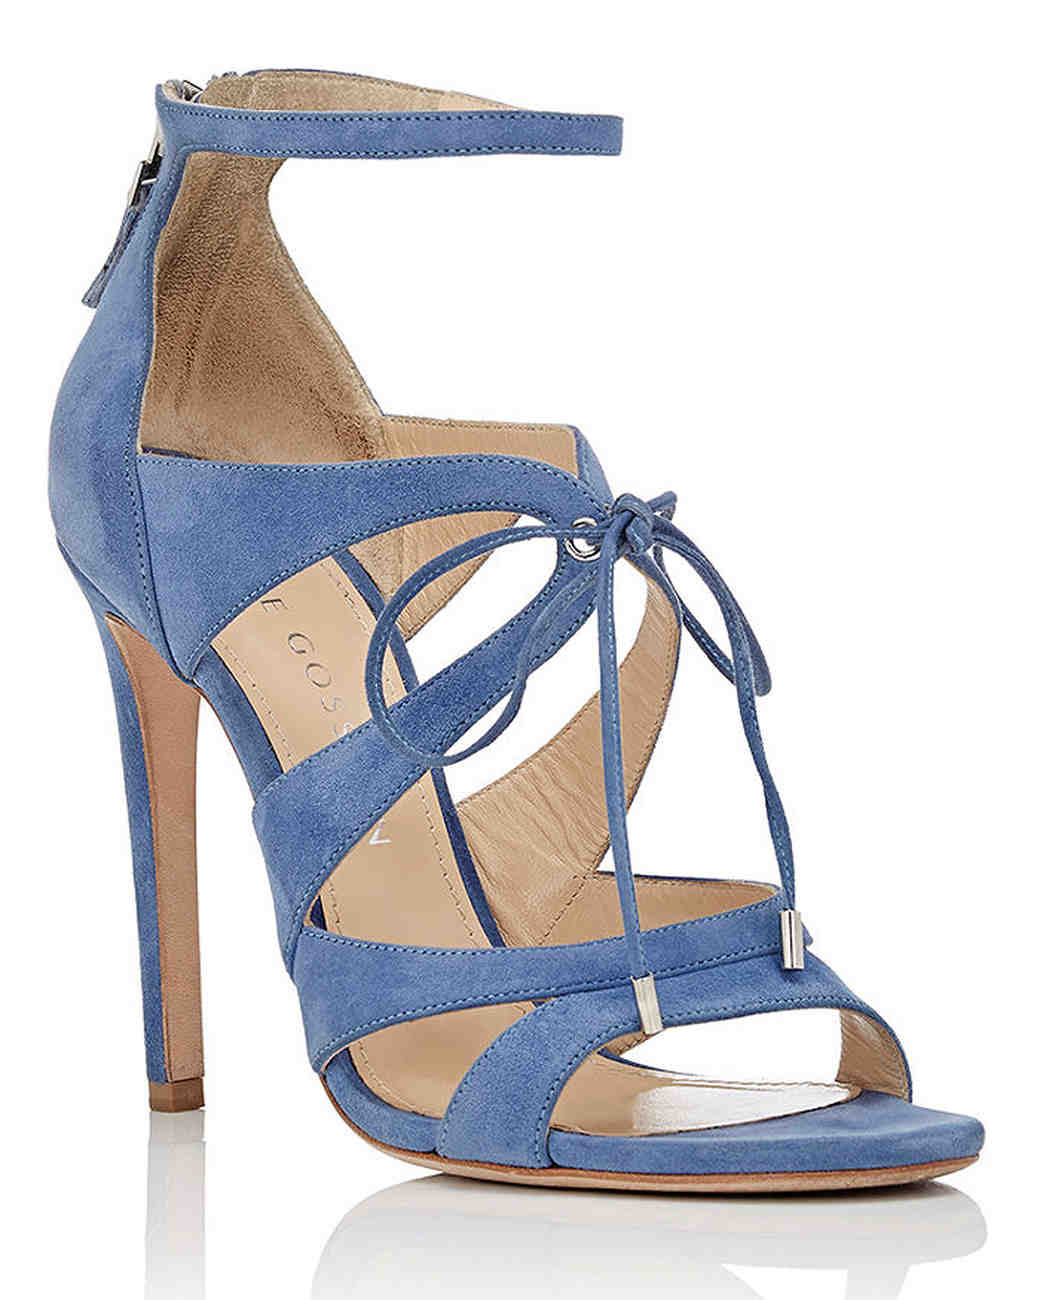 Chloe Blue Suede Shoes